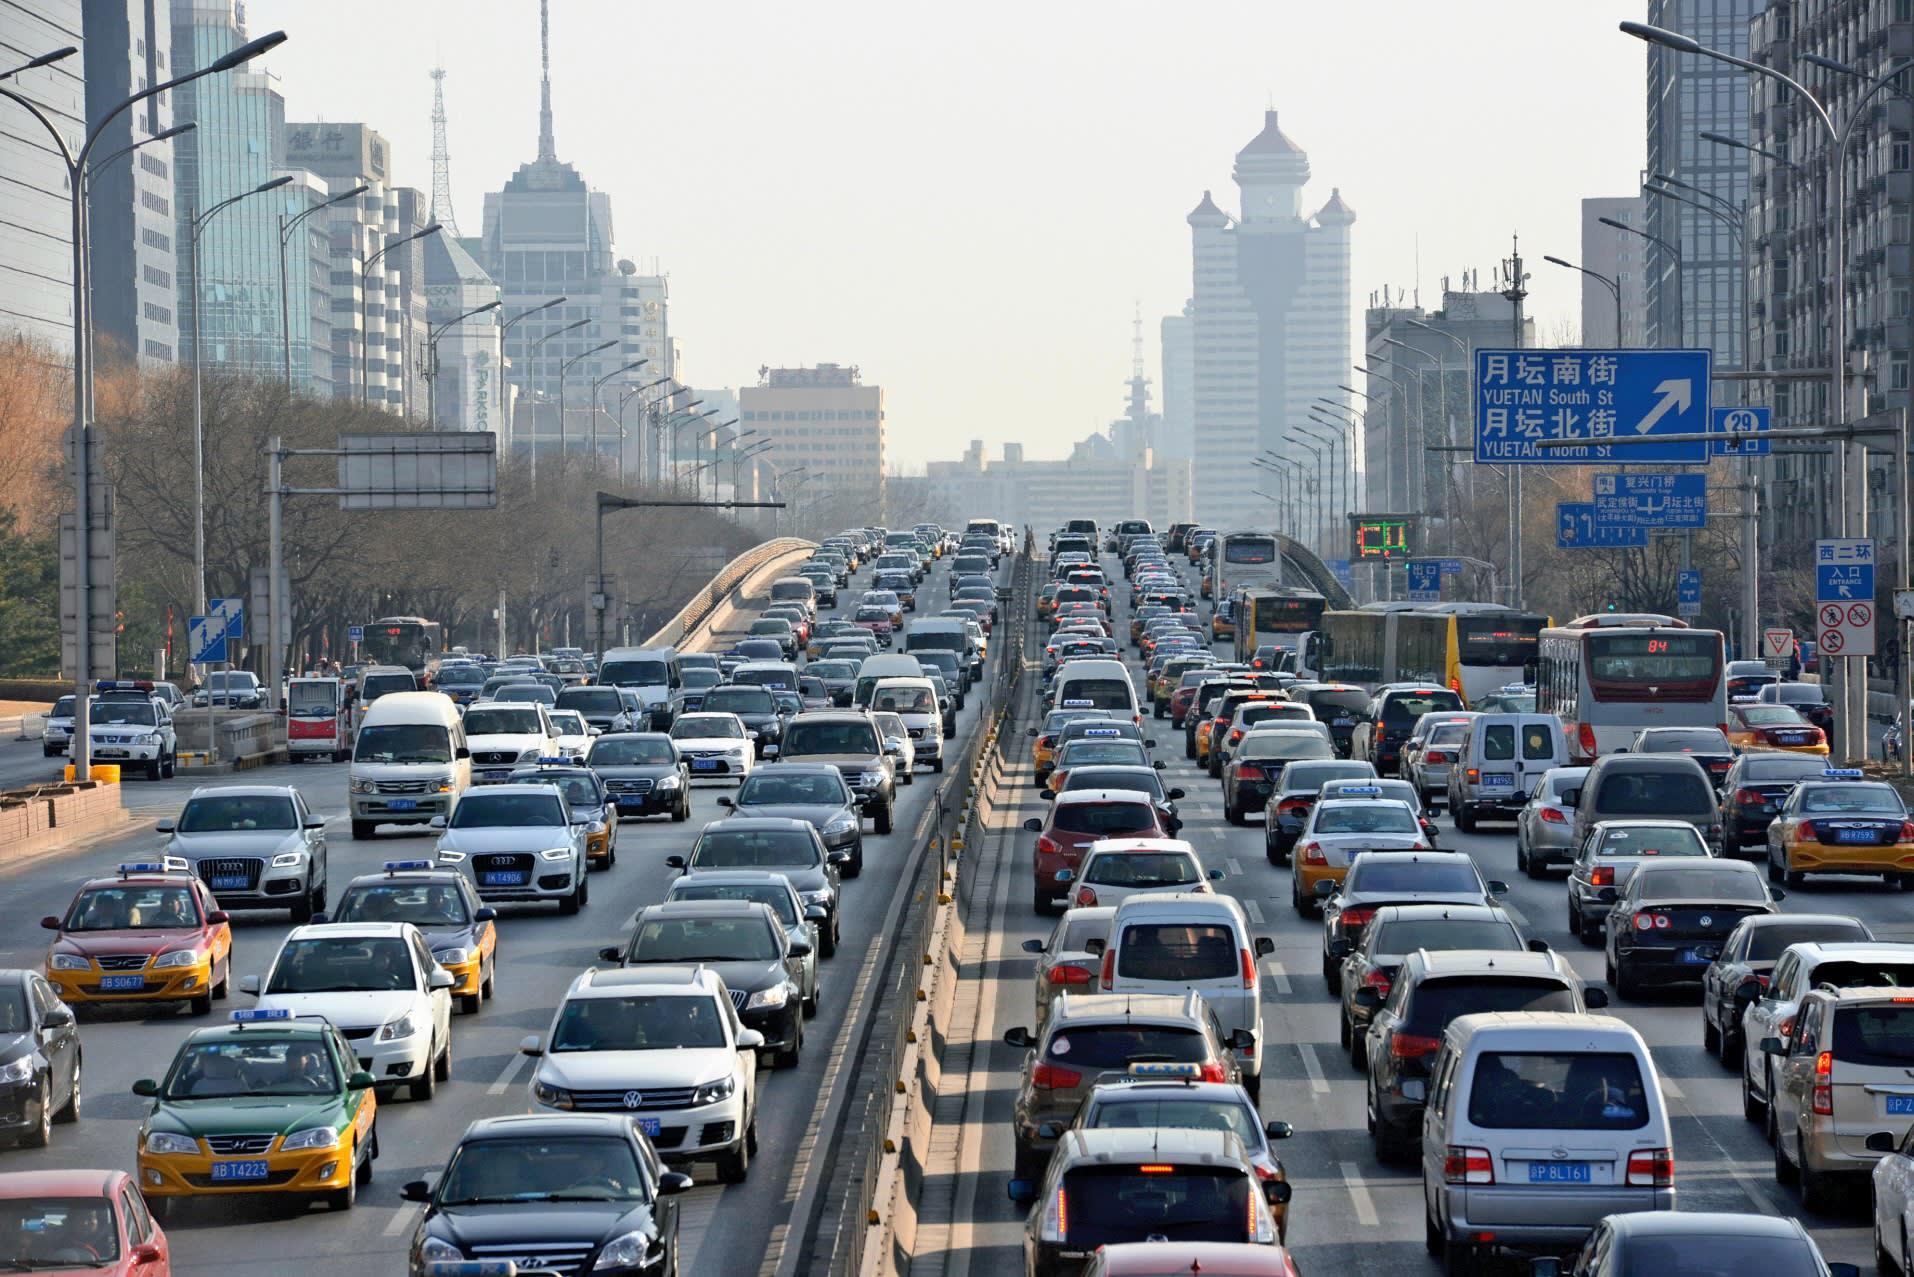 China auto sales lack India s pep but still cruising Nikkei Asian